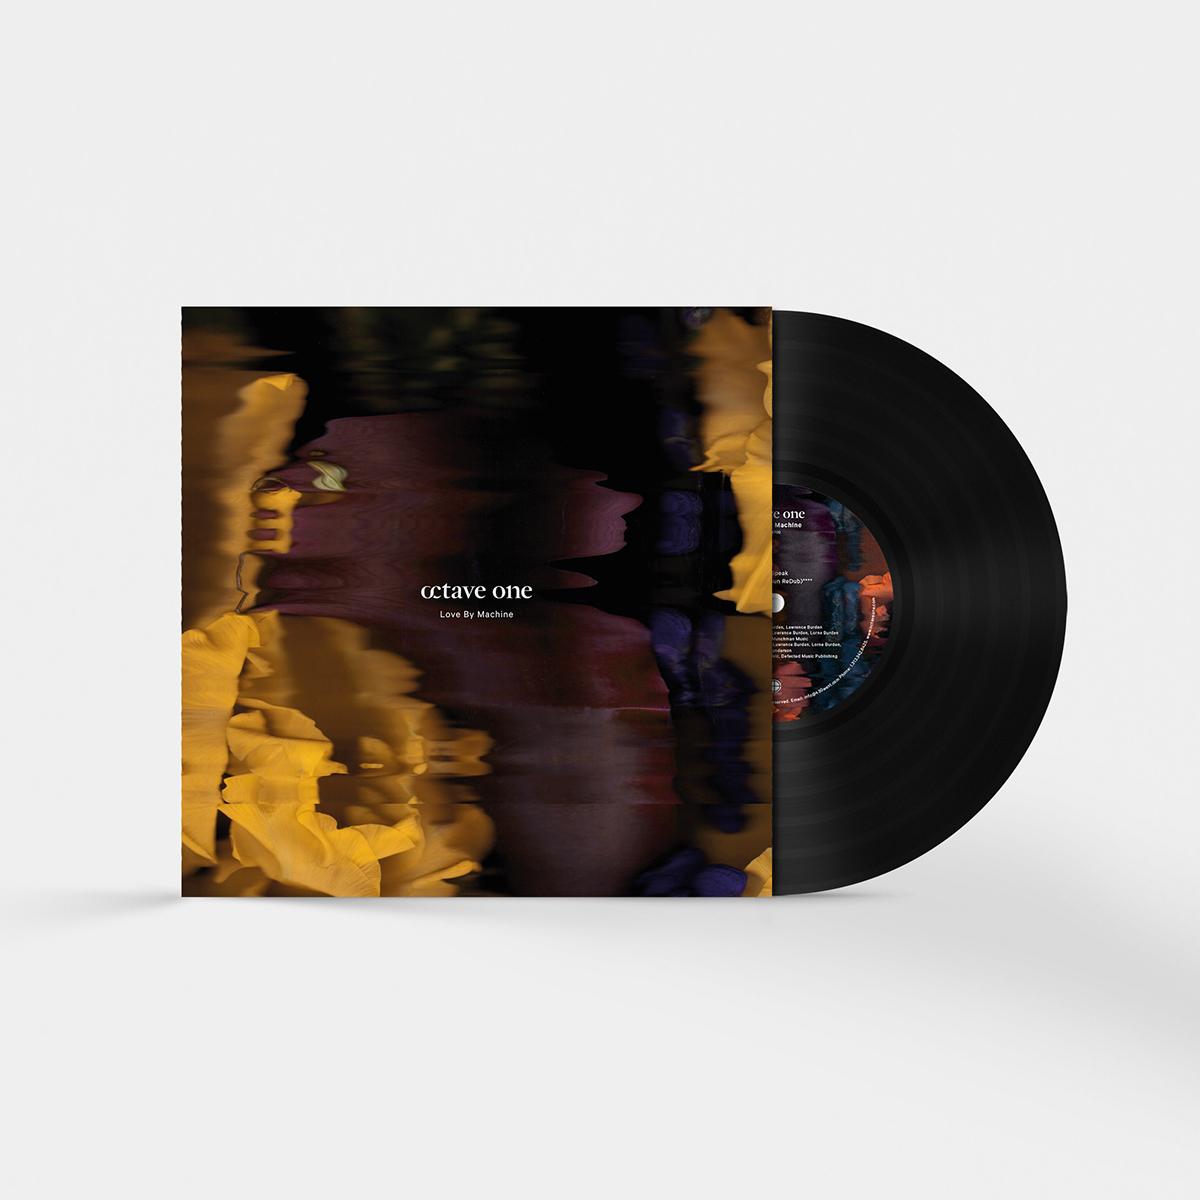 Octave One音乐专辑形象设计 欣赏-第6张